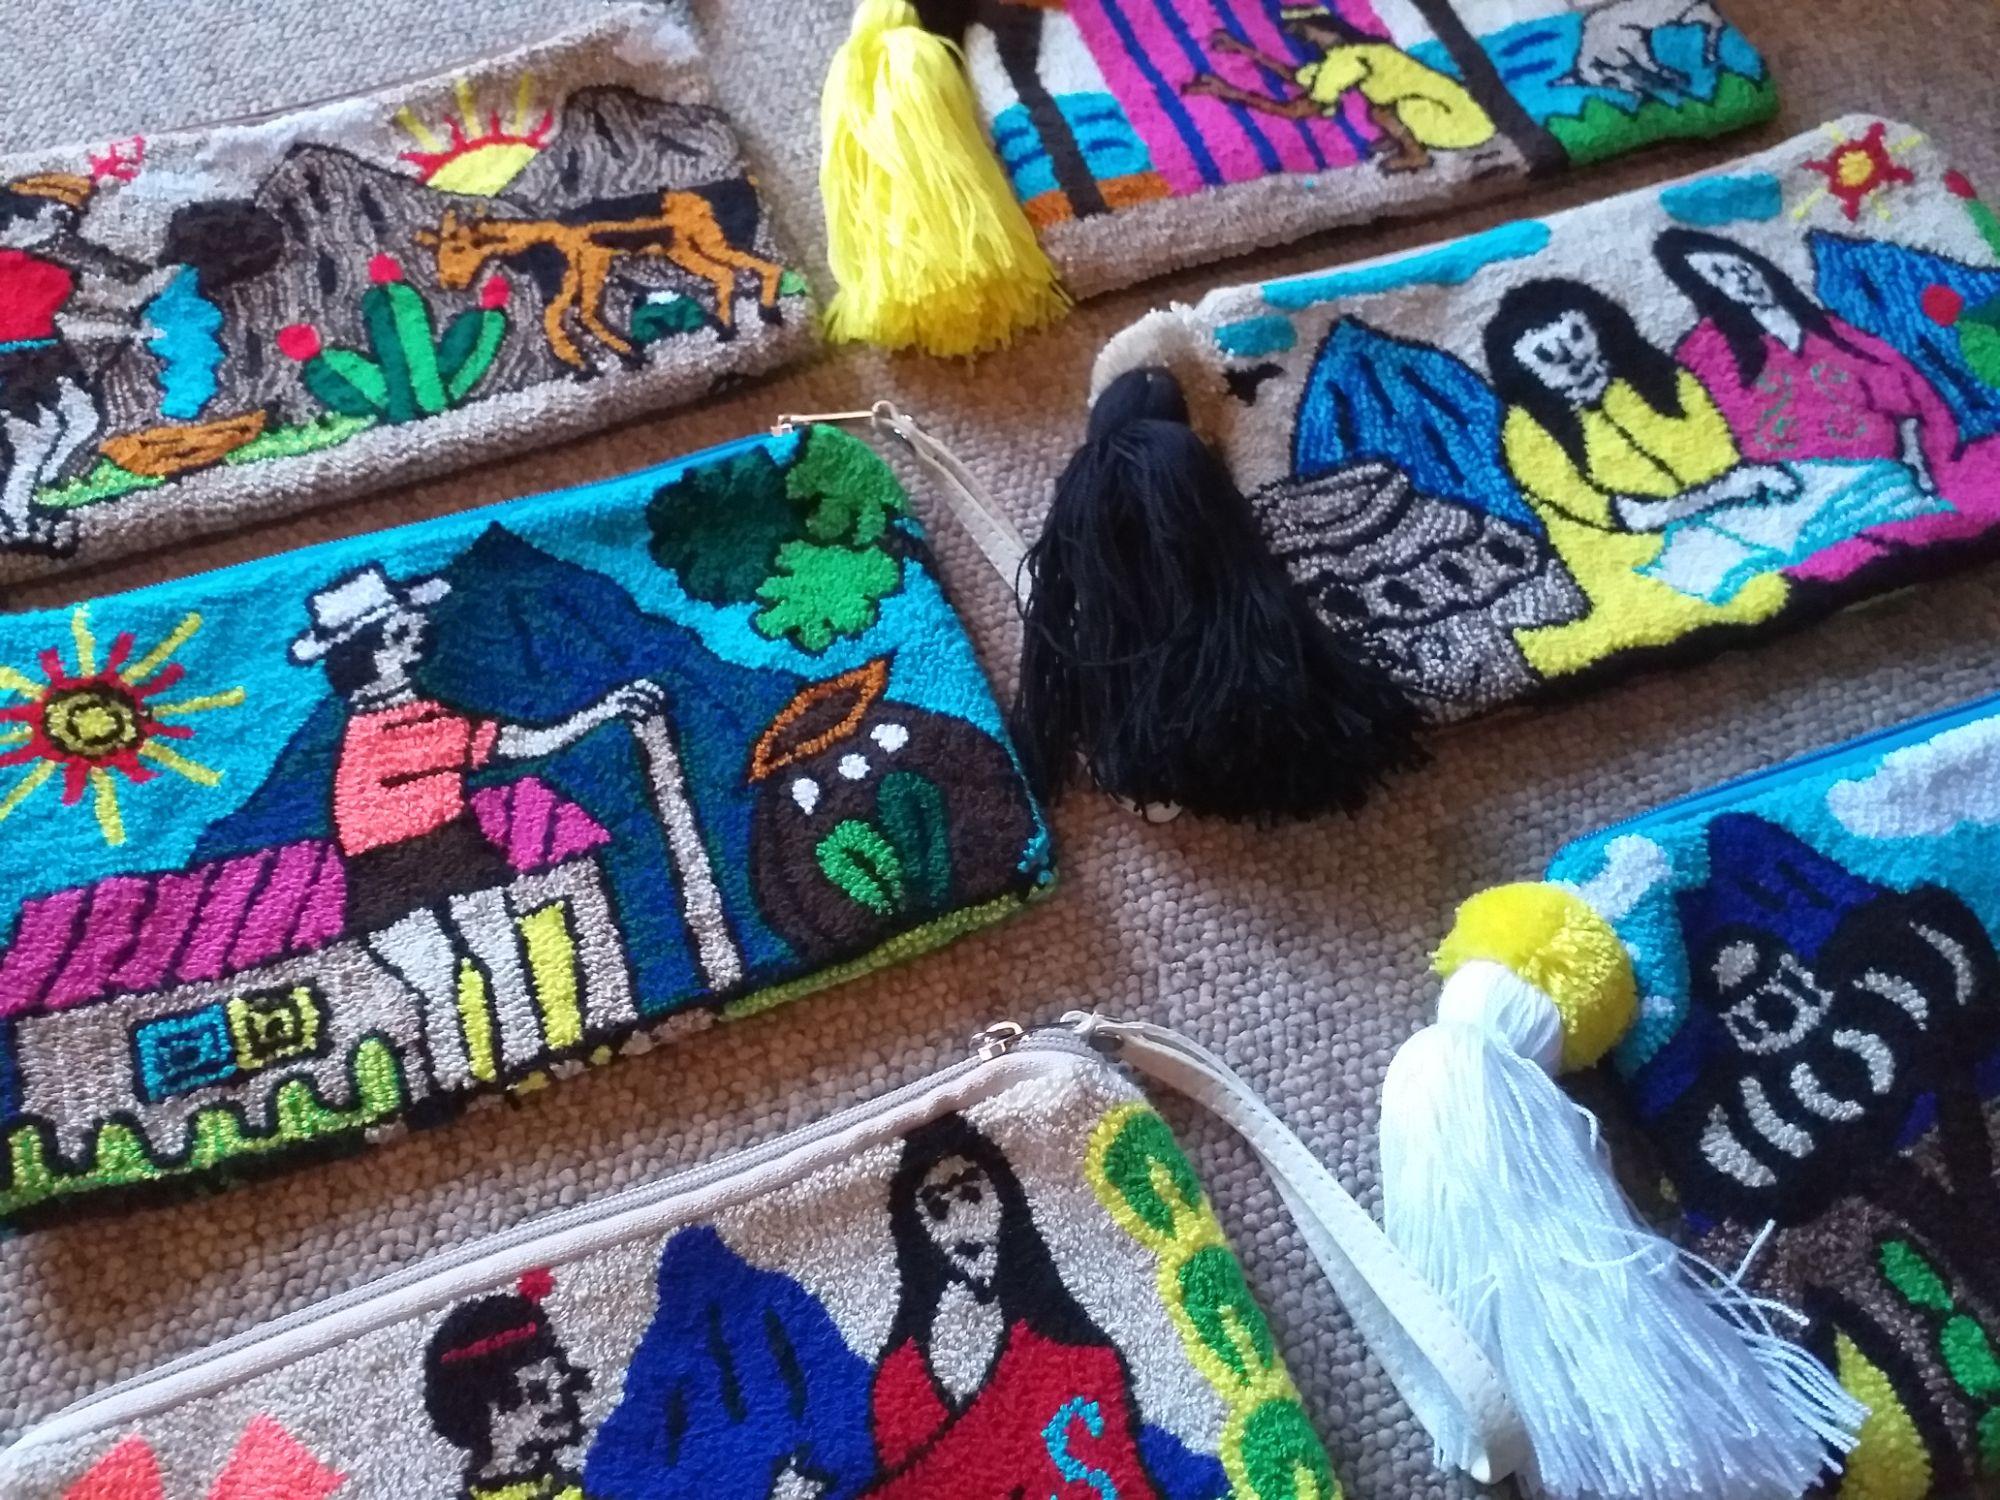 colombian wayuu pouch bags